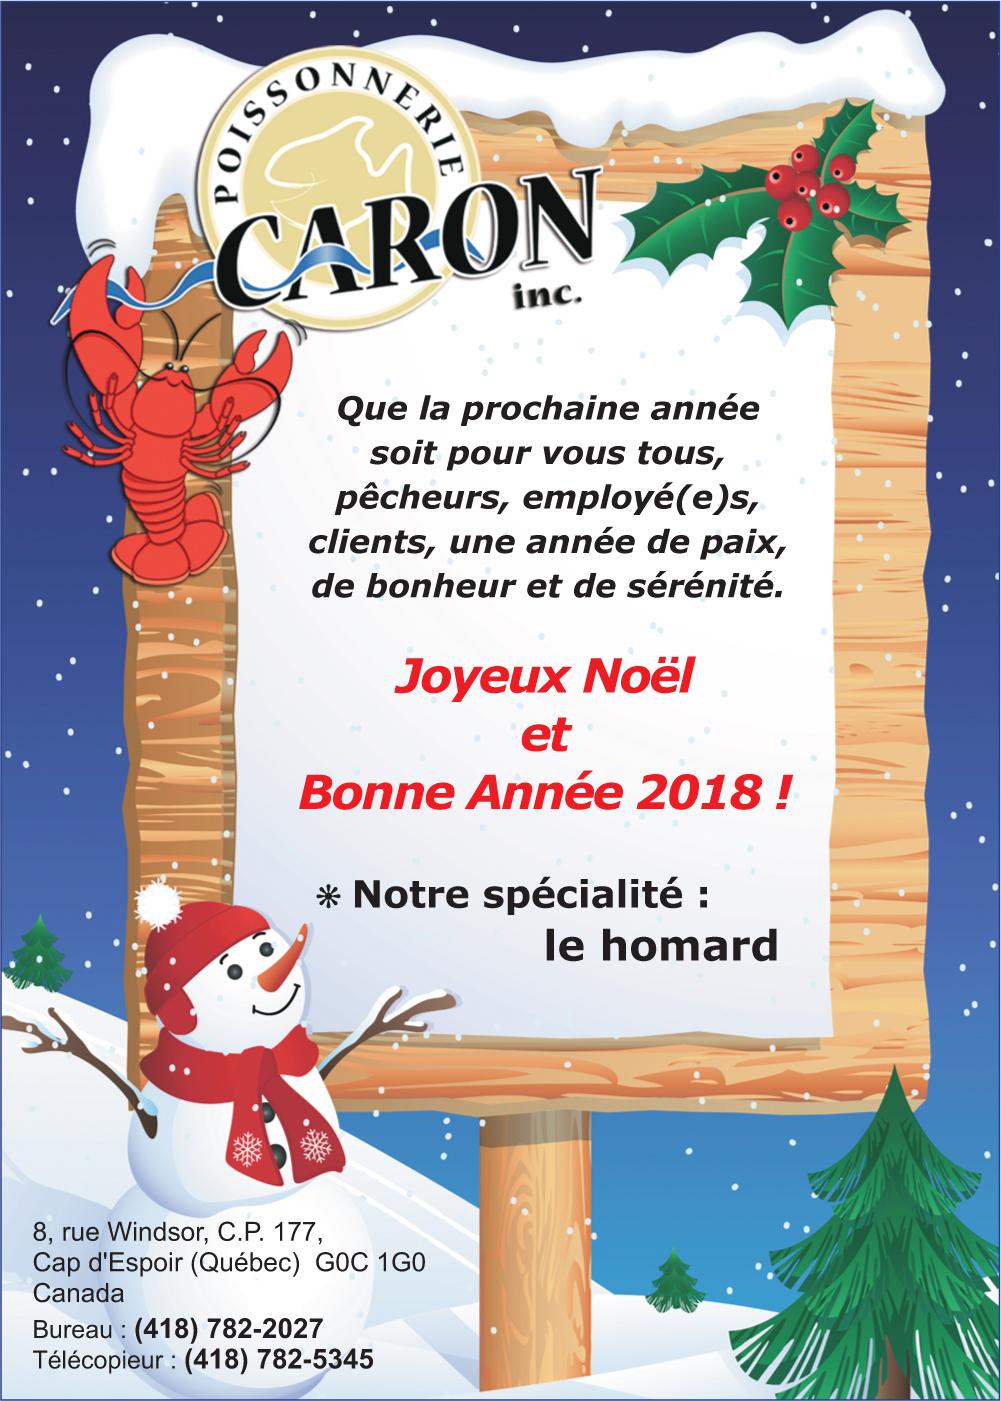 Poissonnerie Caron Inc.